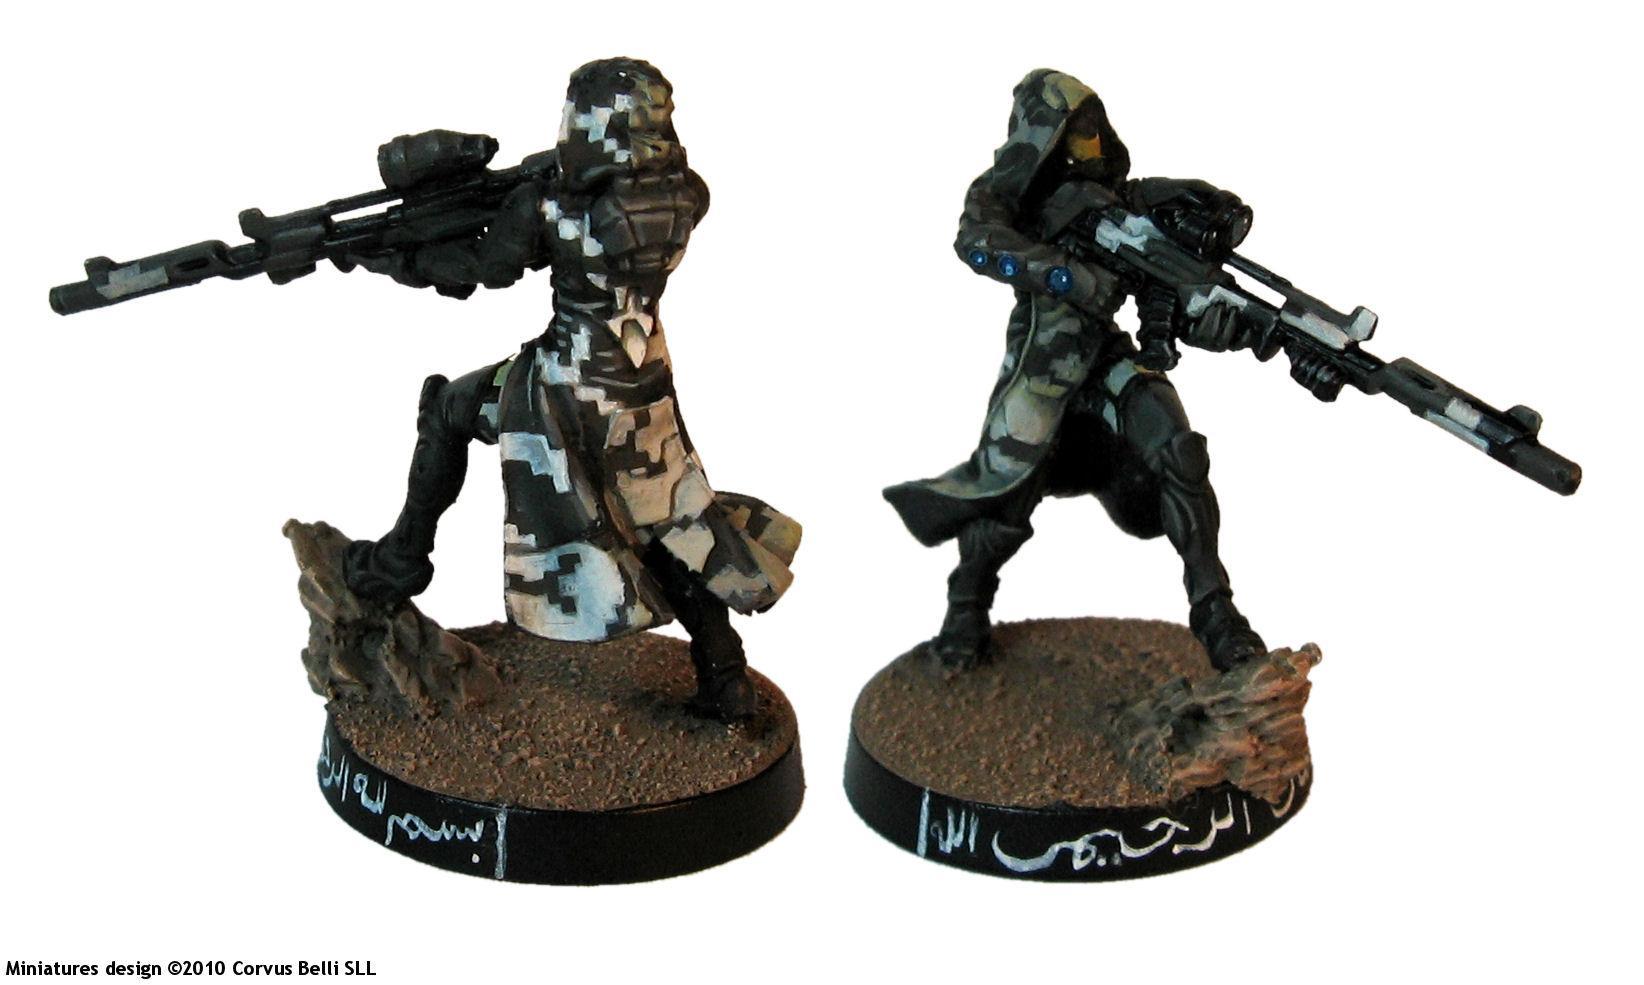 Belli, Camouflage, Corvus, Digital, Haqqislam, Infinity, Lasiq, Omega, Precinct